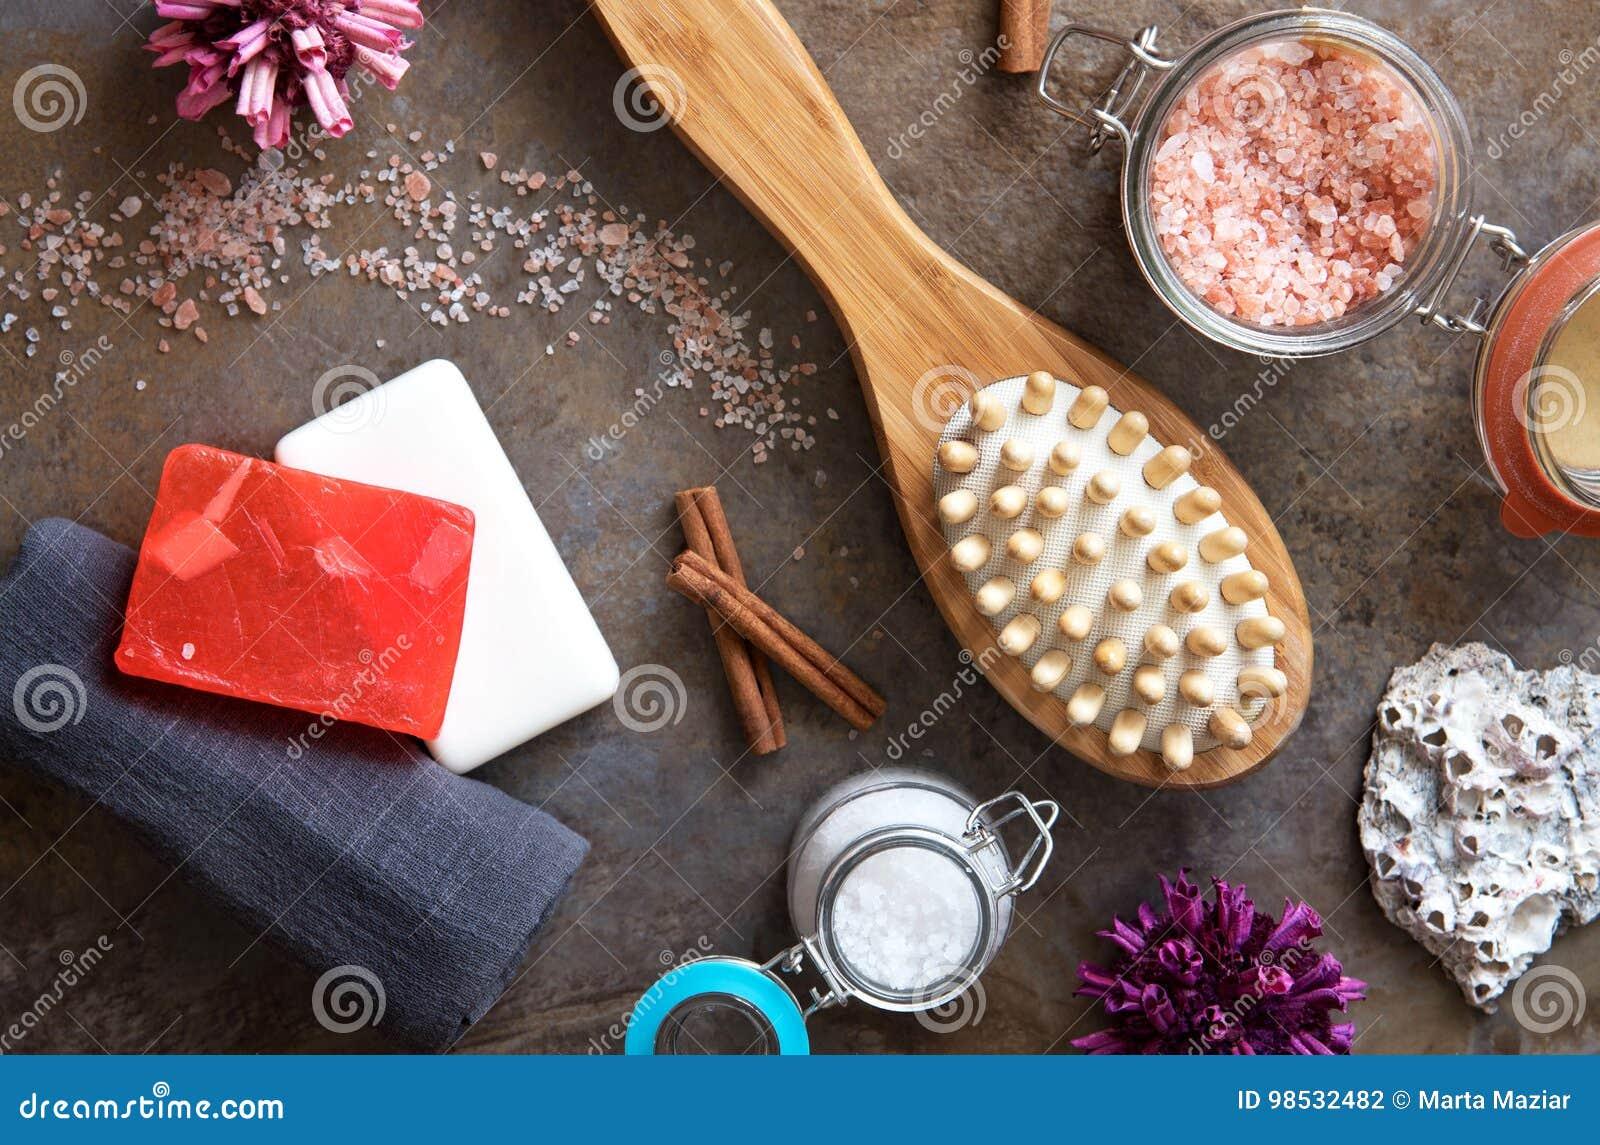 Spa And Wellness - Bath Brush, Towel, Sea Salt And Homemade